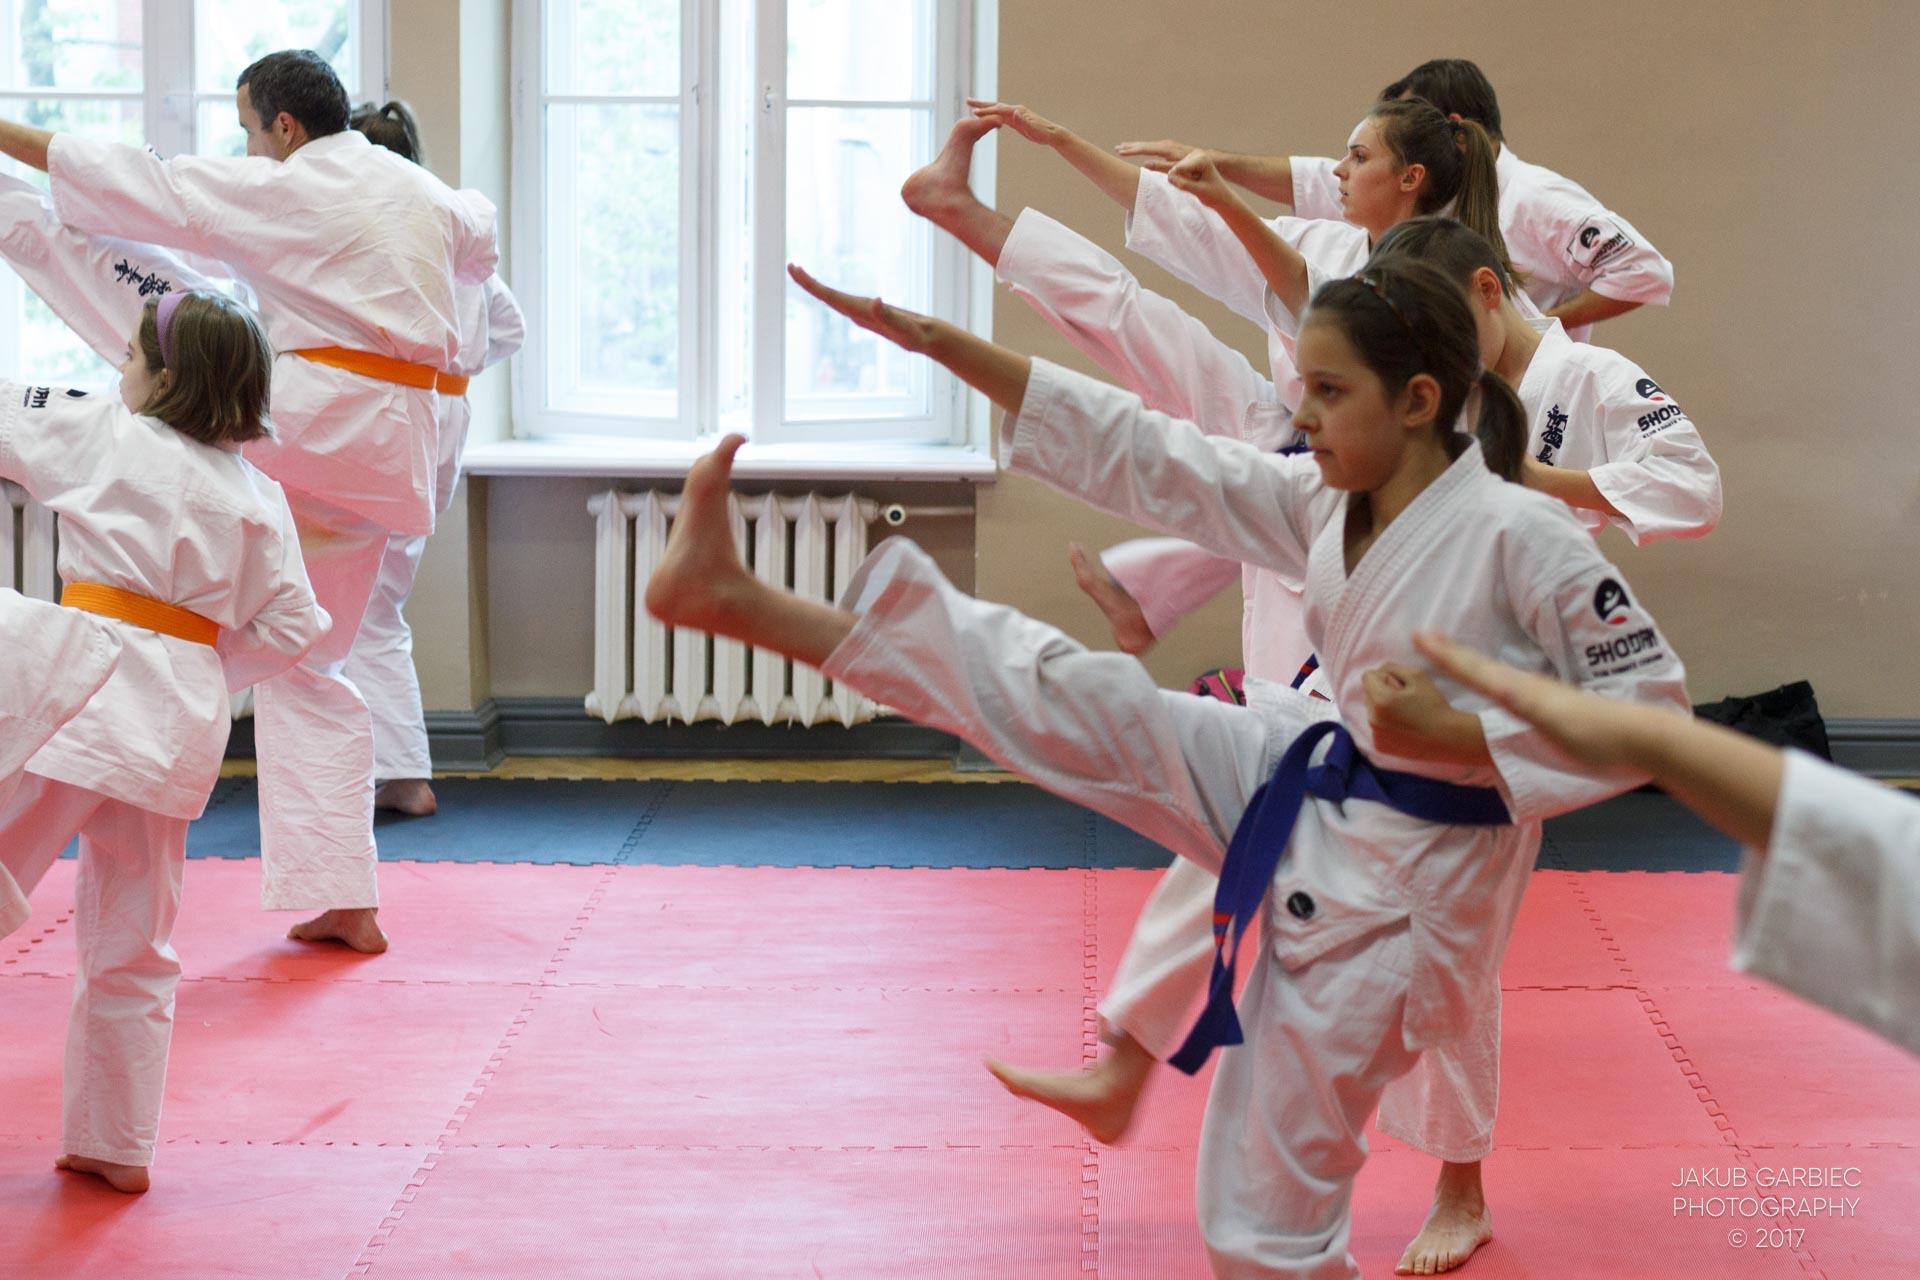 egzamin-karate-mistrz-mariusz-mazur-klub-karate-shodan-2017-06-02-17